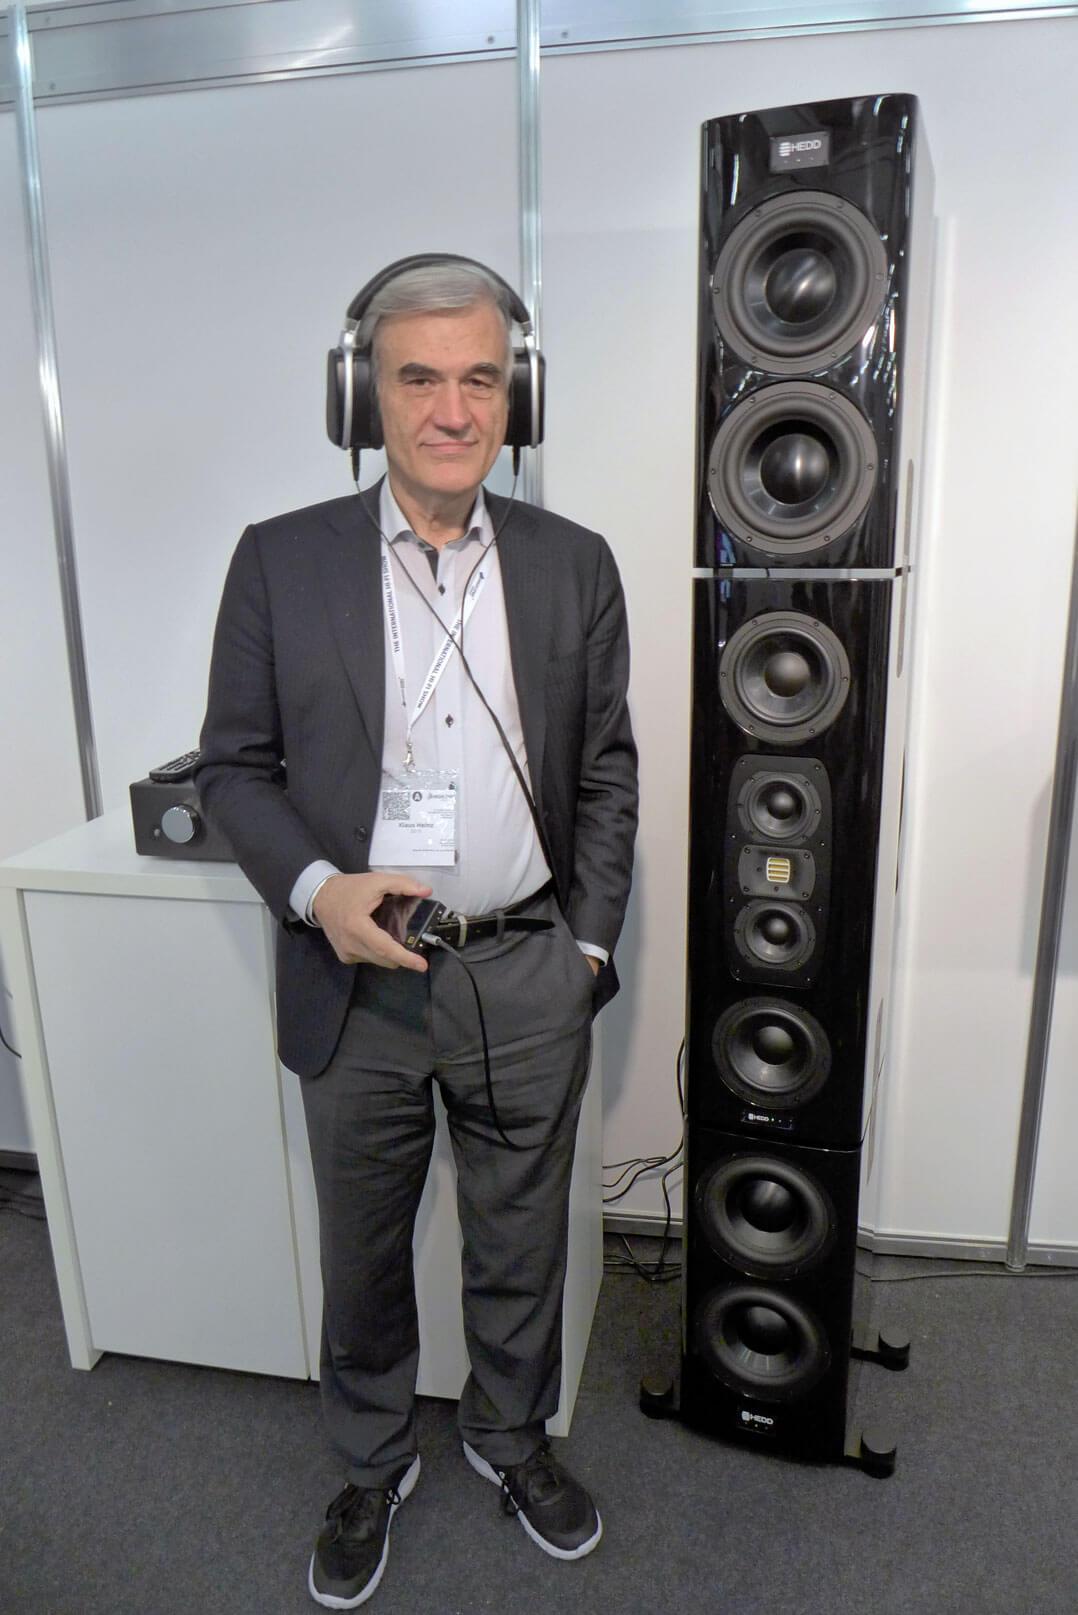 [P1040883] + [P1040876] Klaus Heinz mit dem HEDDphone neben dem HEDD Tower Monitor // HEDDphone Prototyp